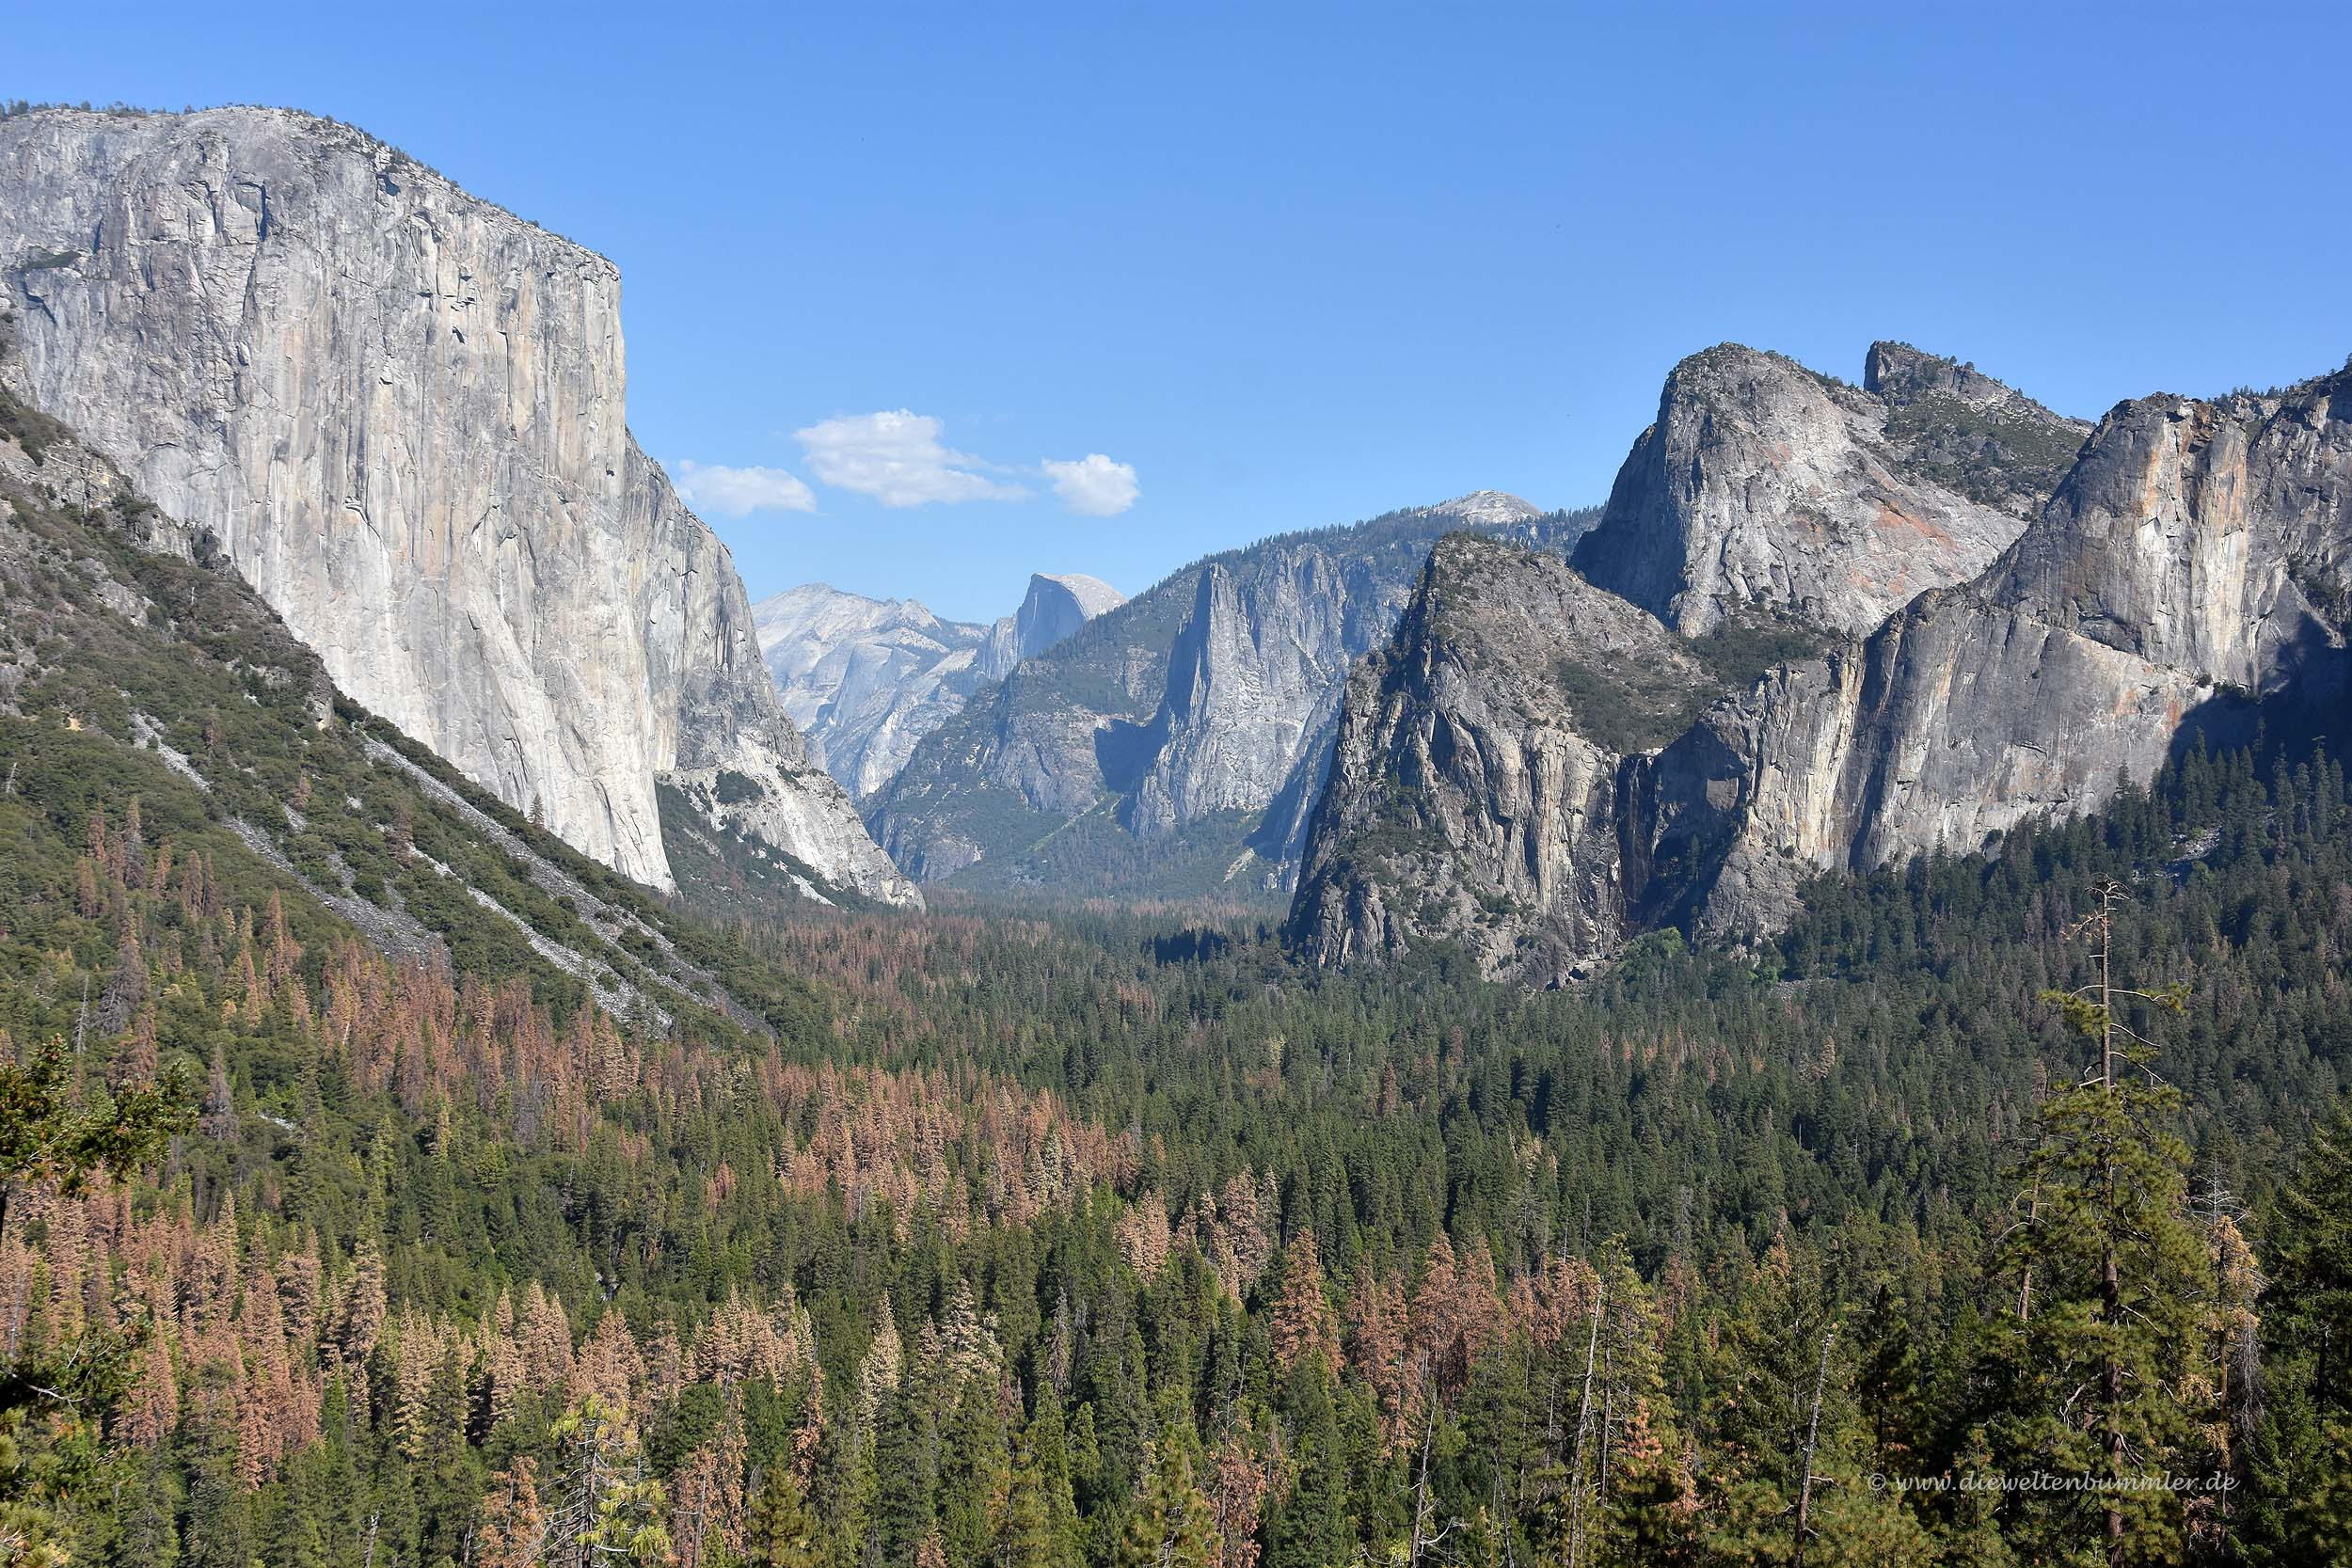 Blick in das Yosemite-Tal